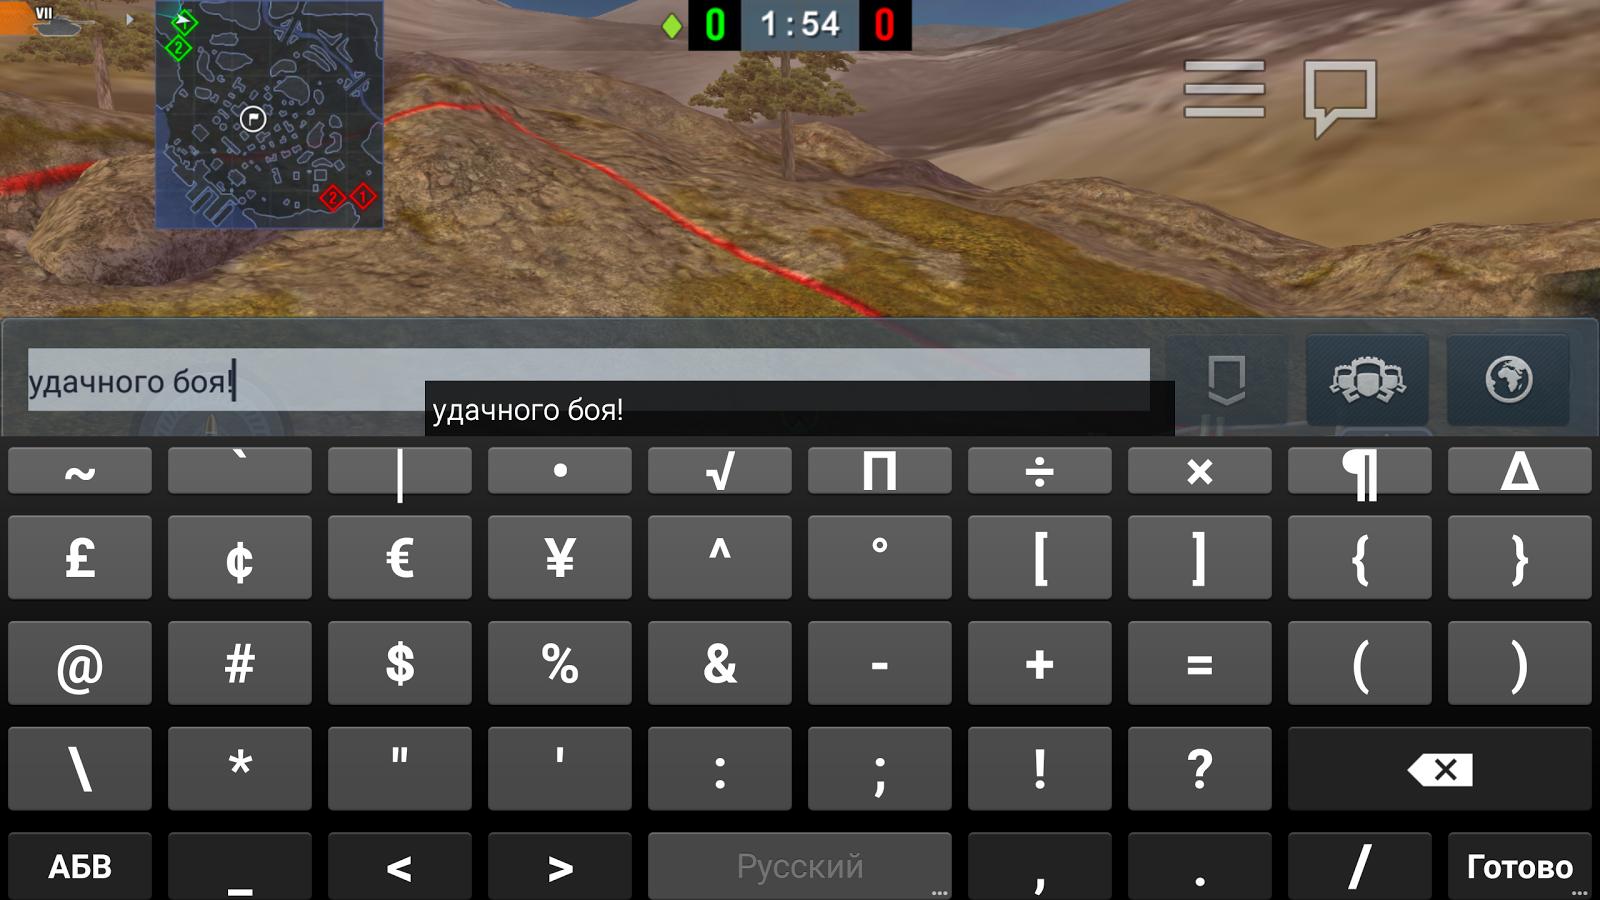 WoT Blitz Battle Chat Fix 1 0 2 APK Download - Android Tools